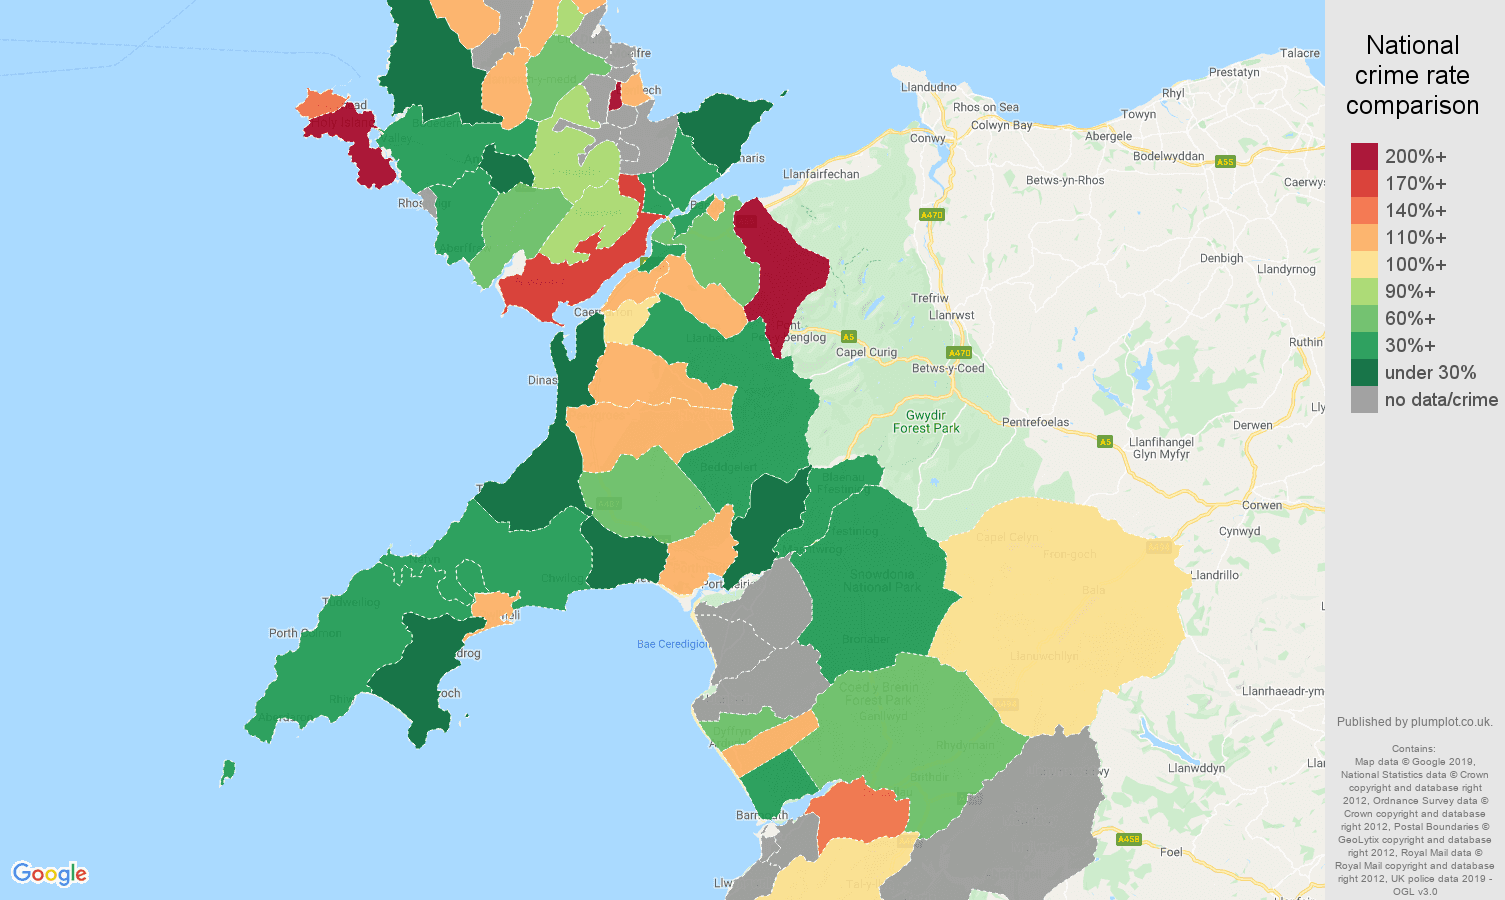 Gwynedd other crime rate comparison map